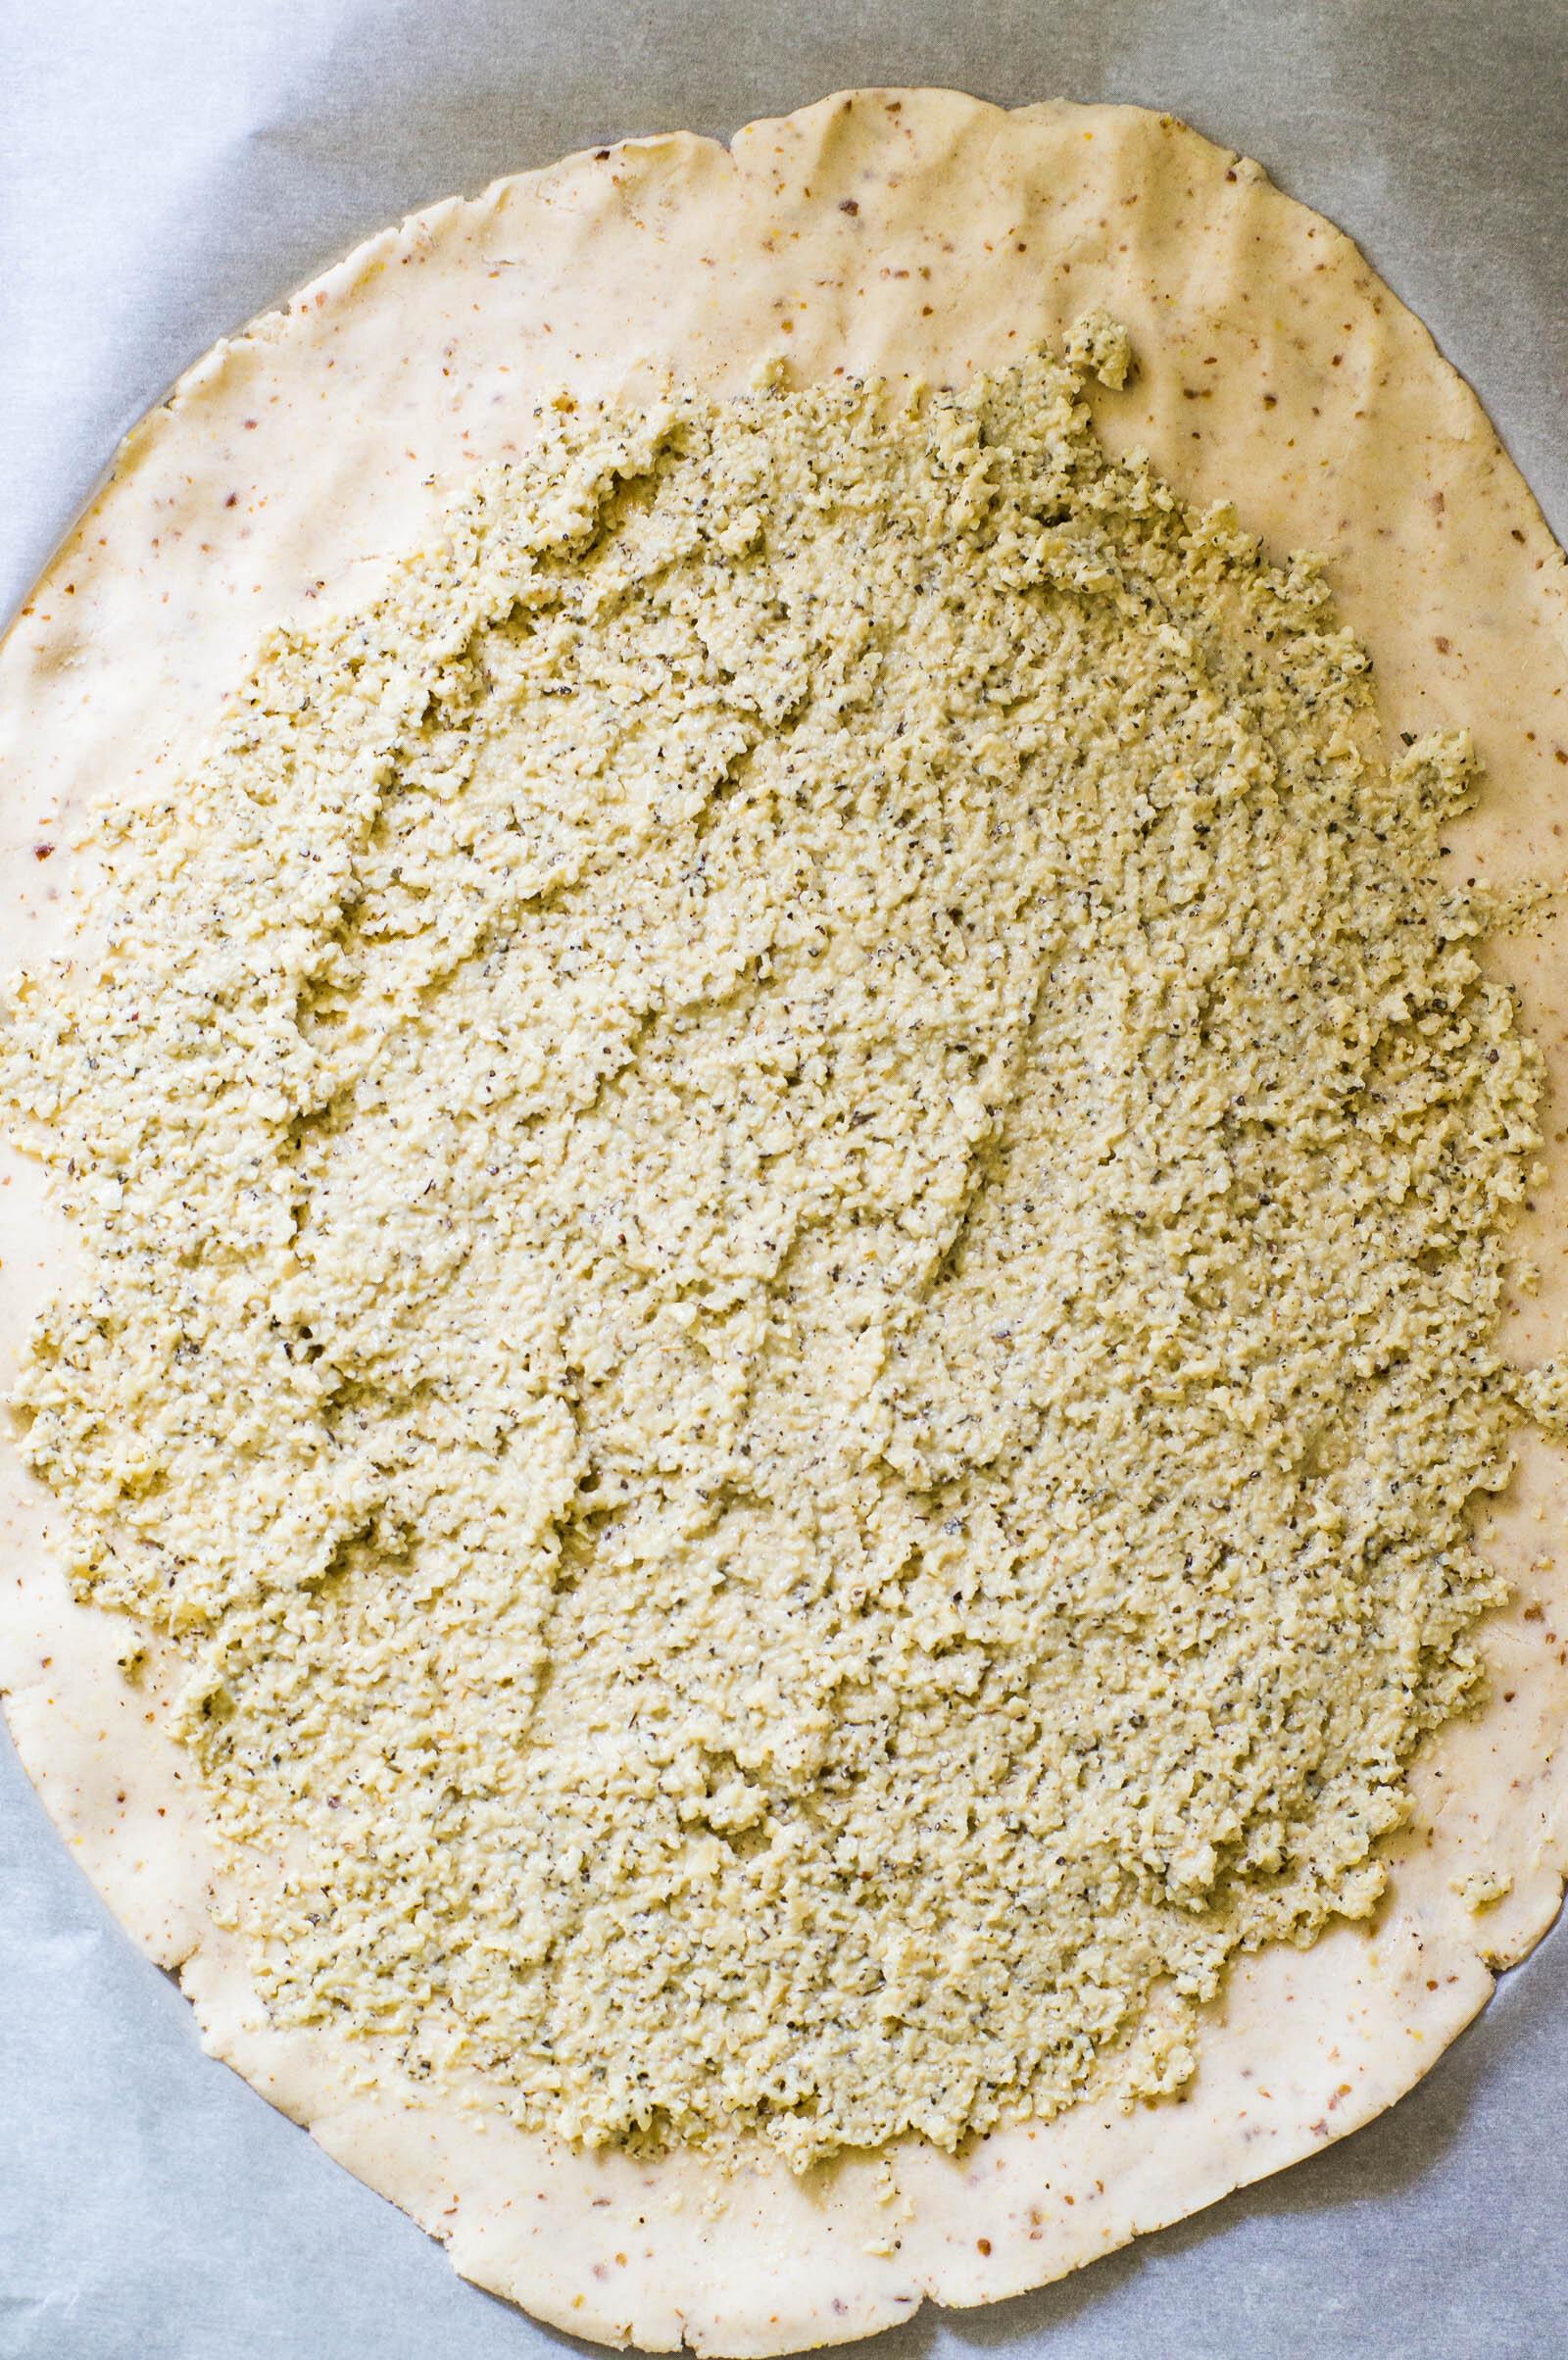 No-chill cassava flour galette crust with Paleo and vegan no-soak cashew ricotta